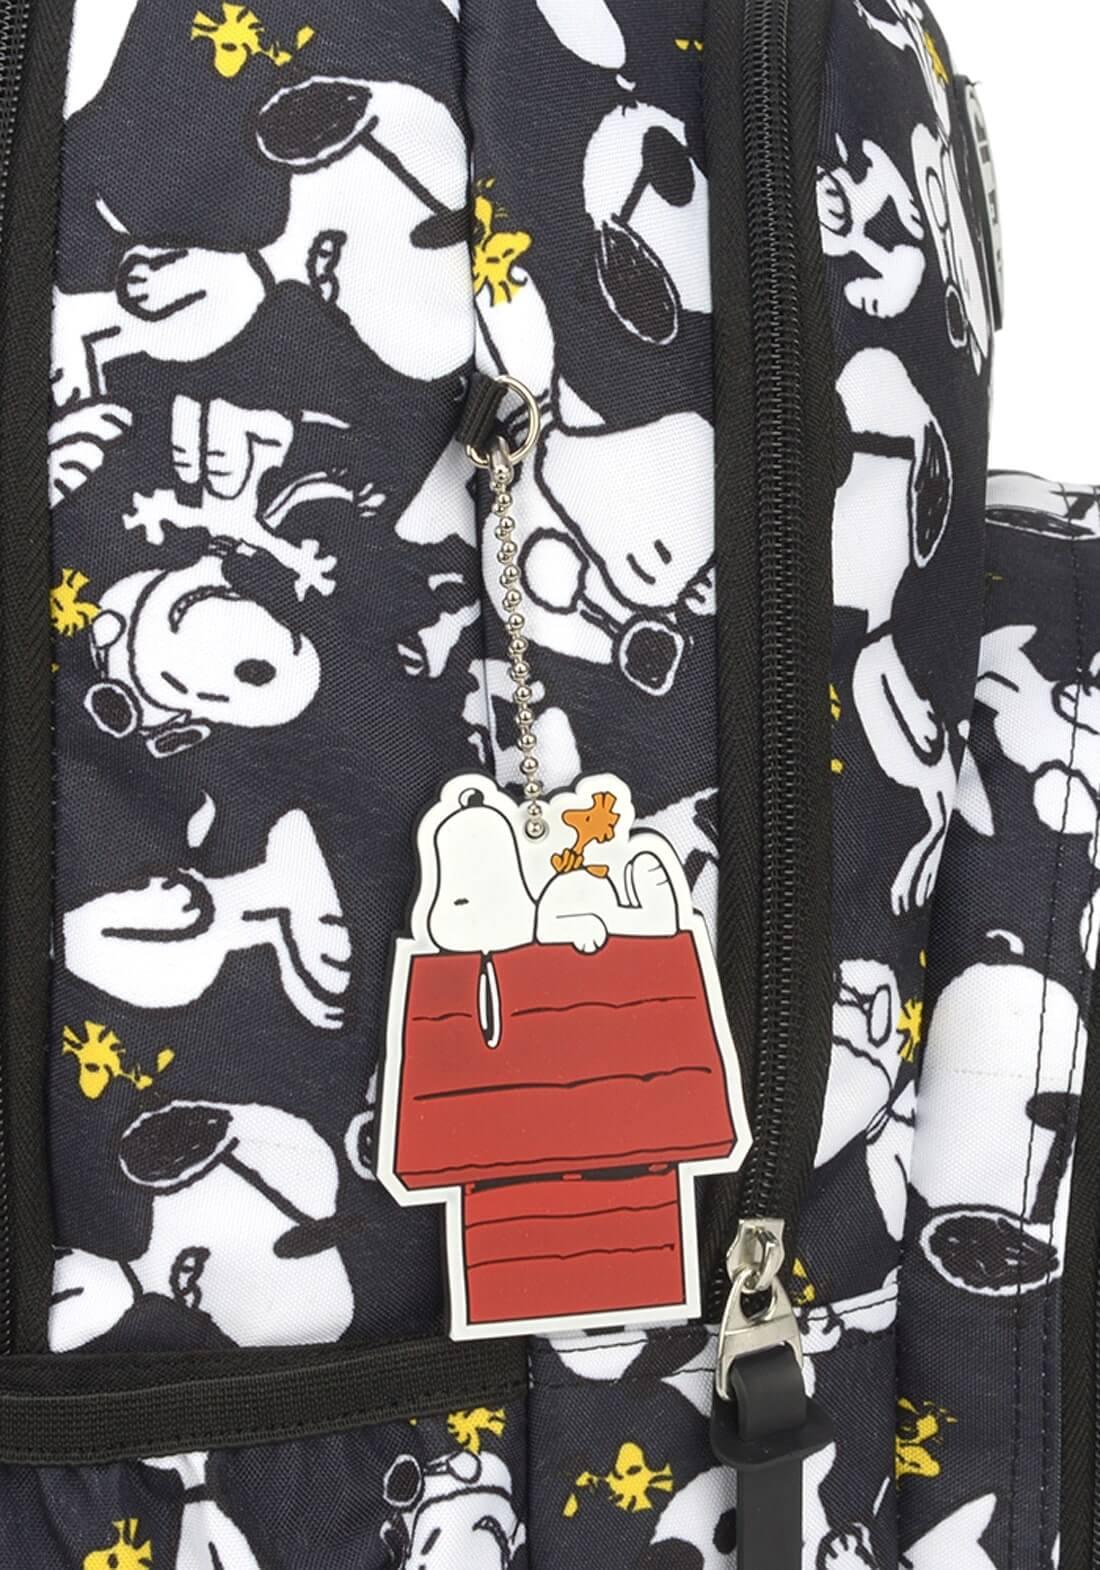 Mochila Notebook Peaunuts Snoopy by Up4You Preta Original